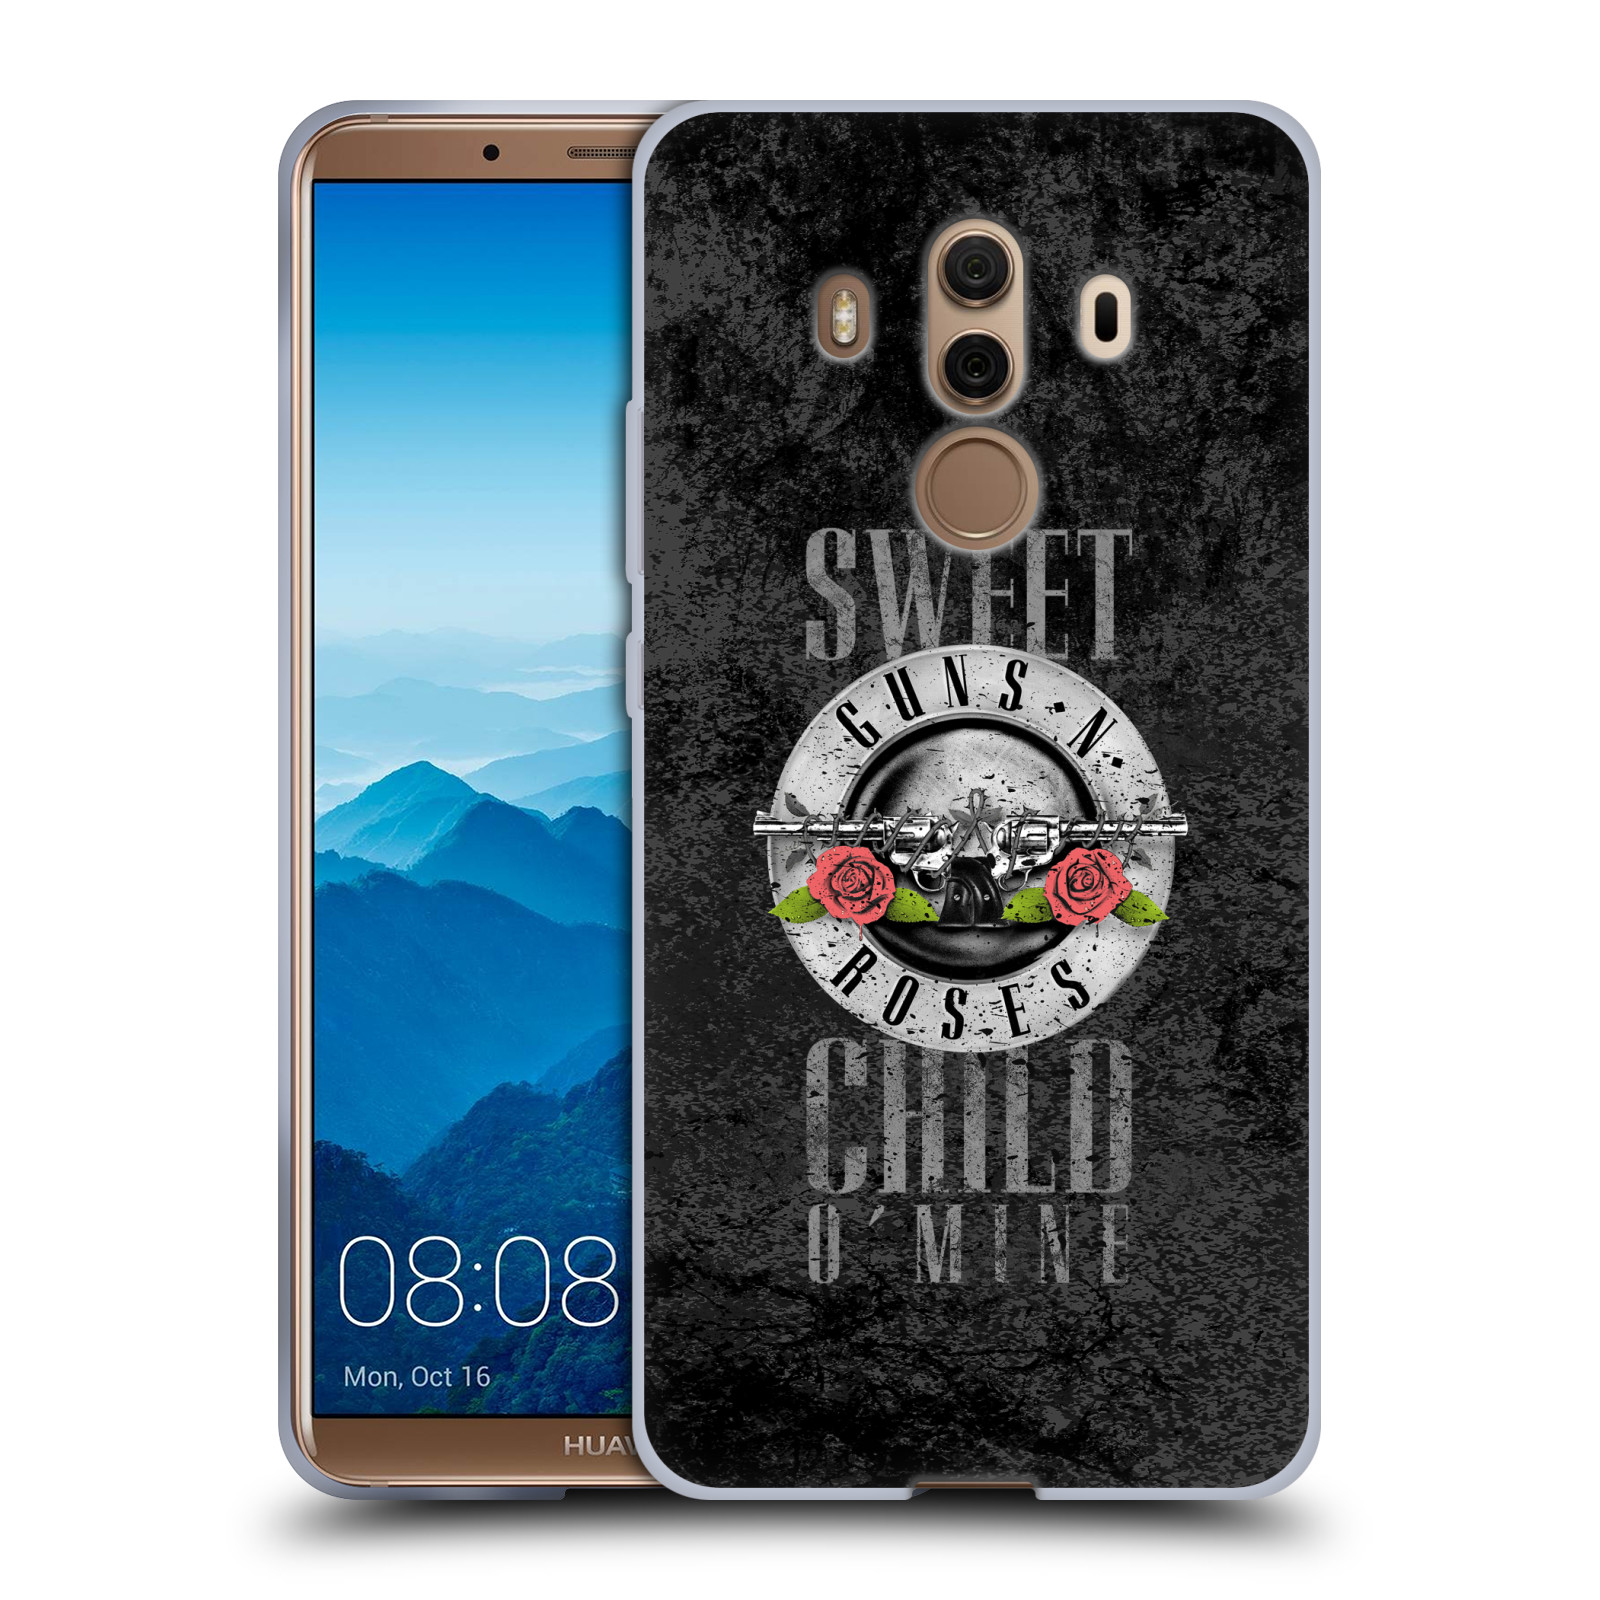 Silikonové pouzdro na mobil Huawei Mate 10 Pro - Head Case - Guns N' Roses - Sweet Child